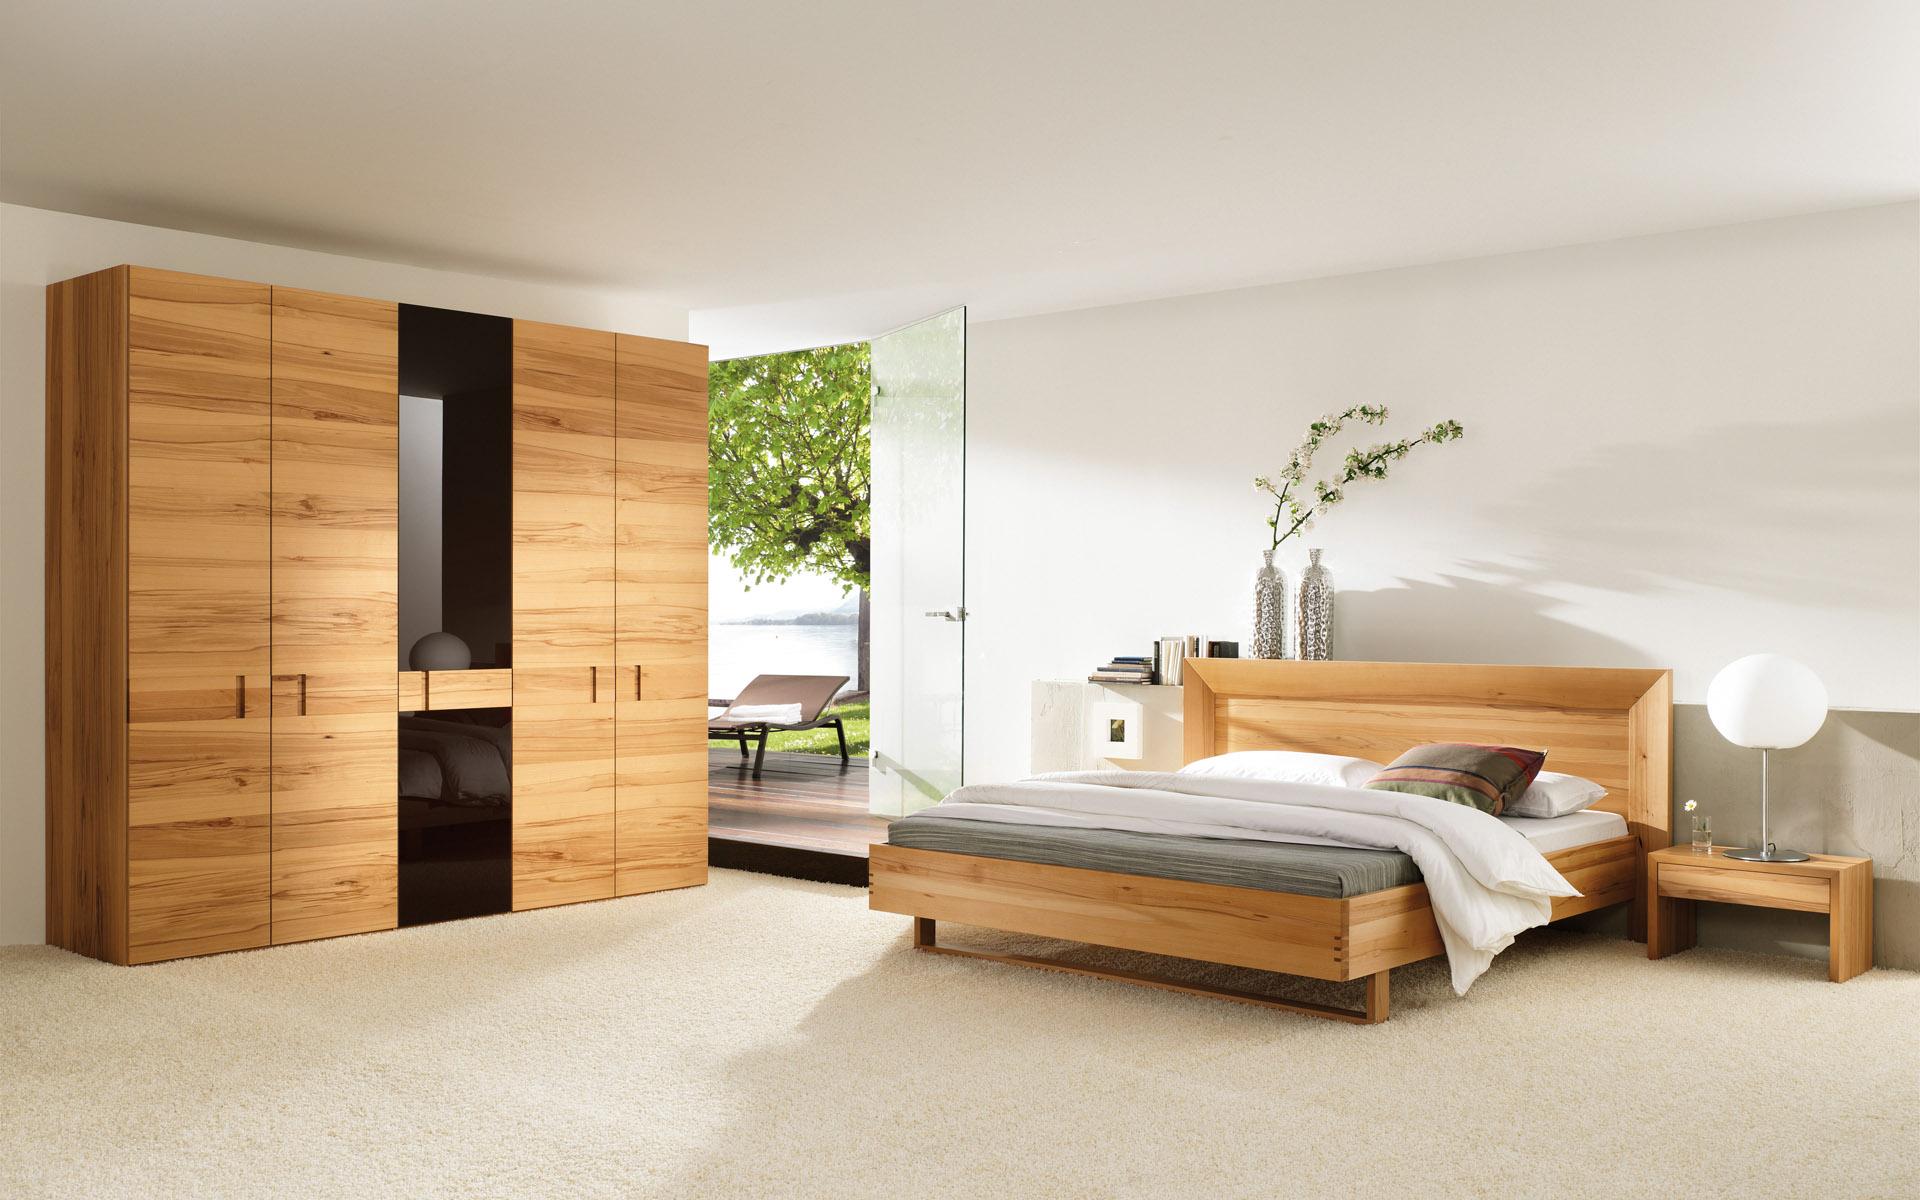 Best Design Wallpaper Photo Art Bedroom   Decoseecom 1920x1200